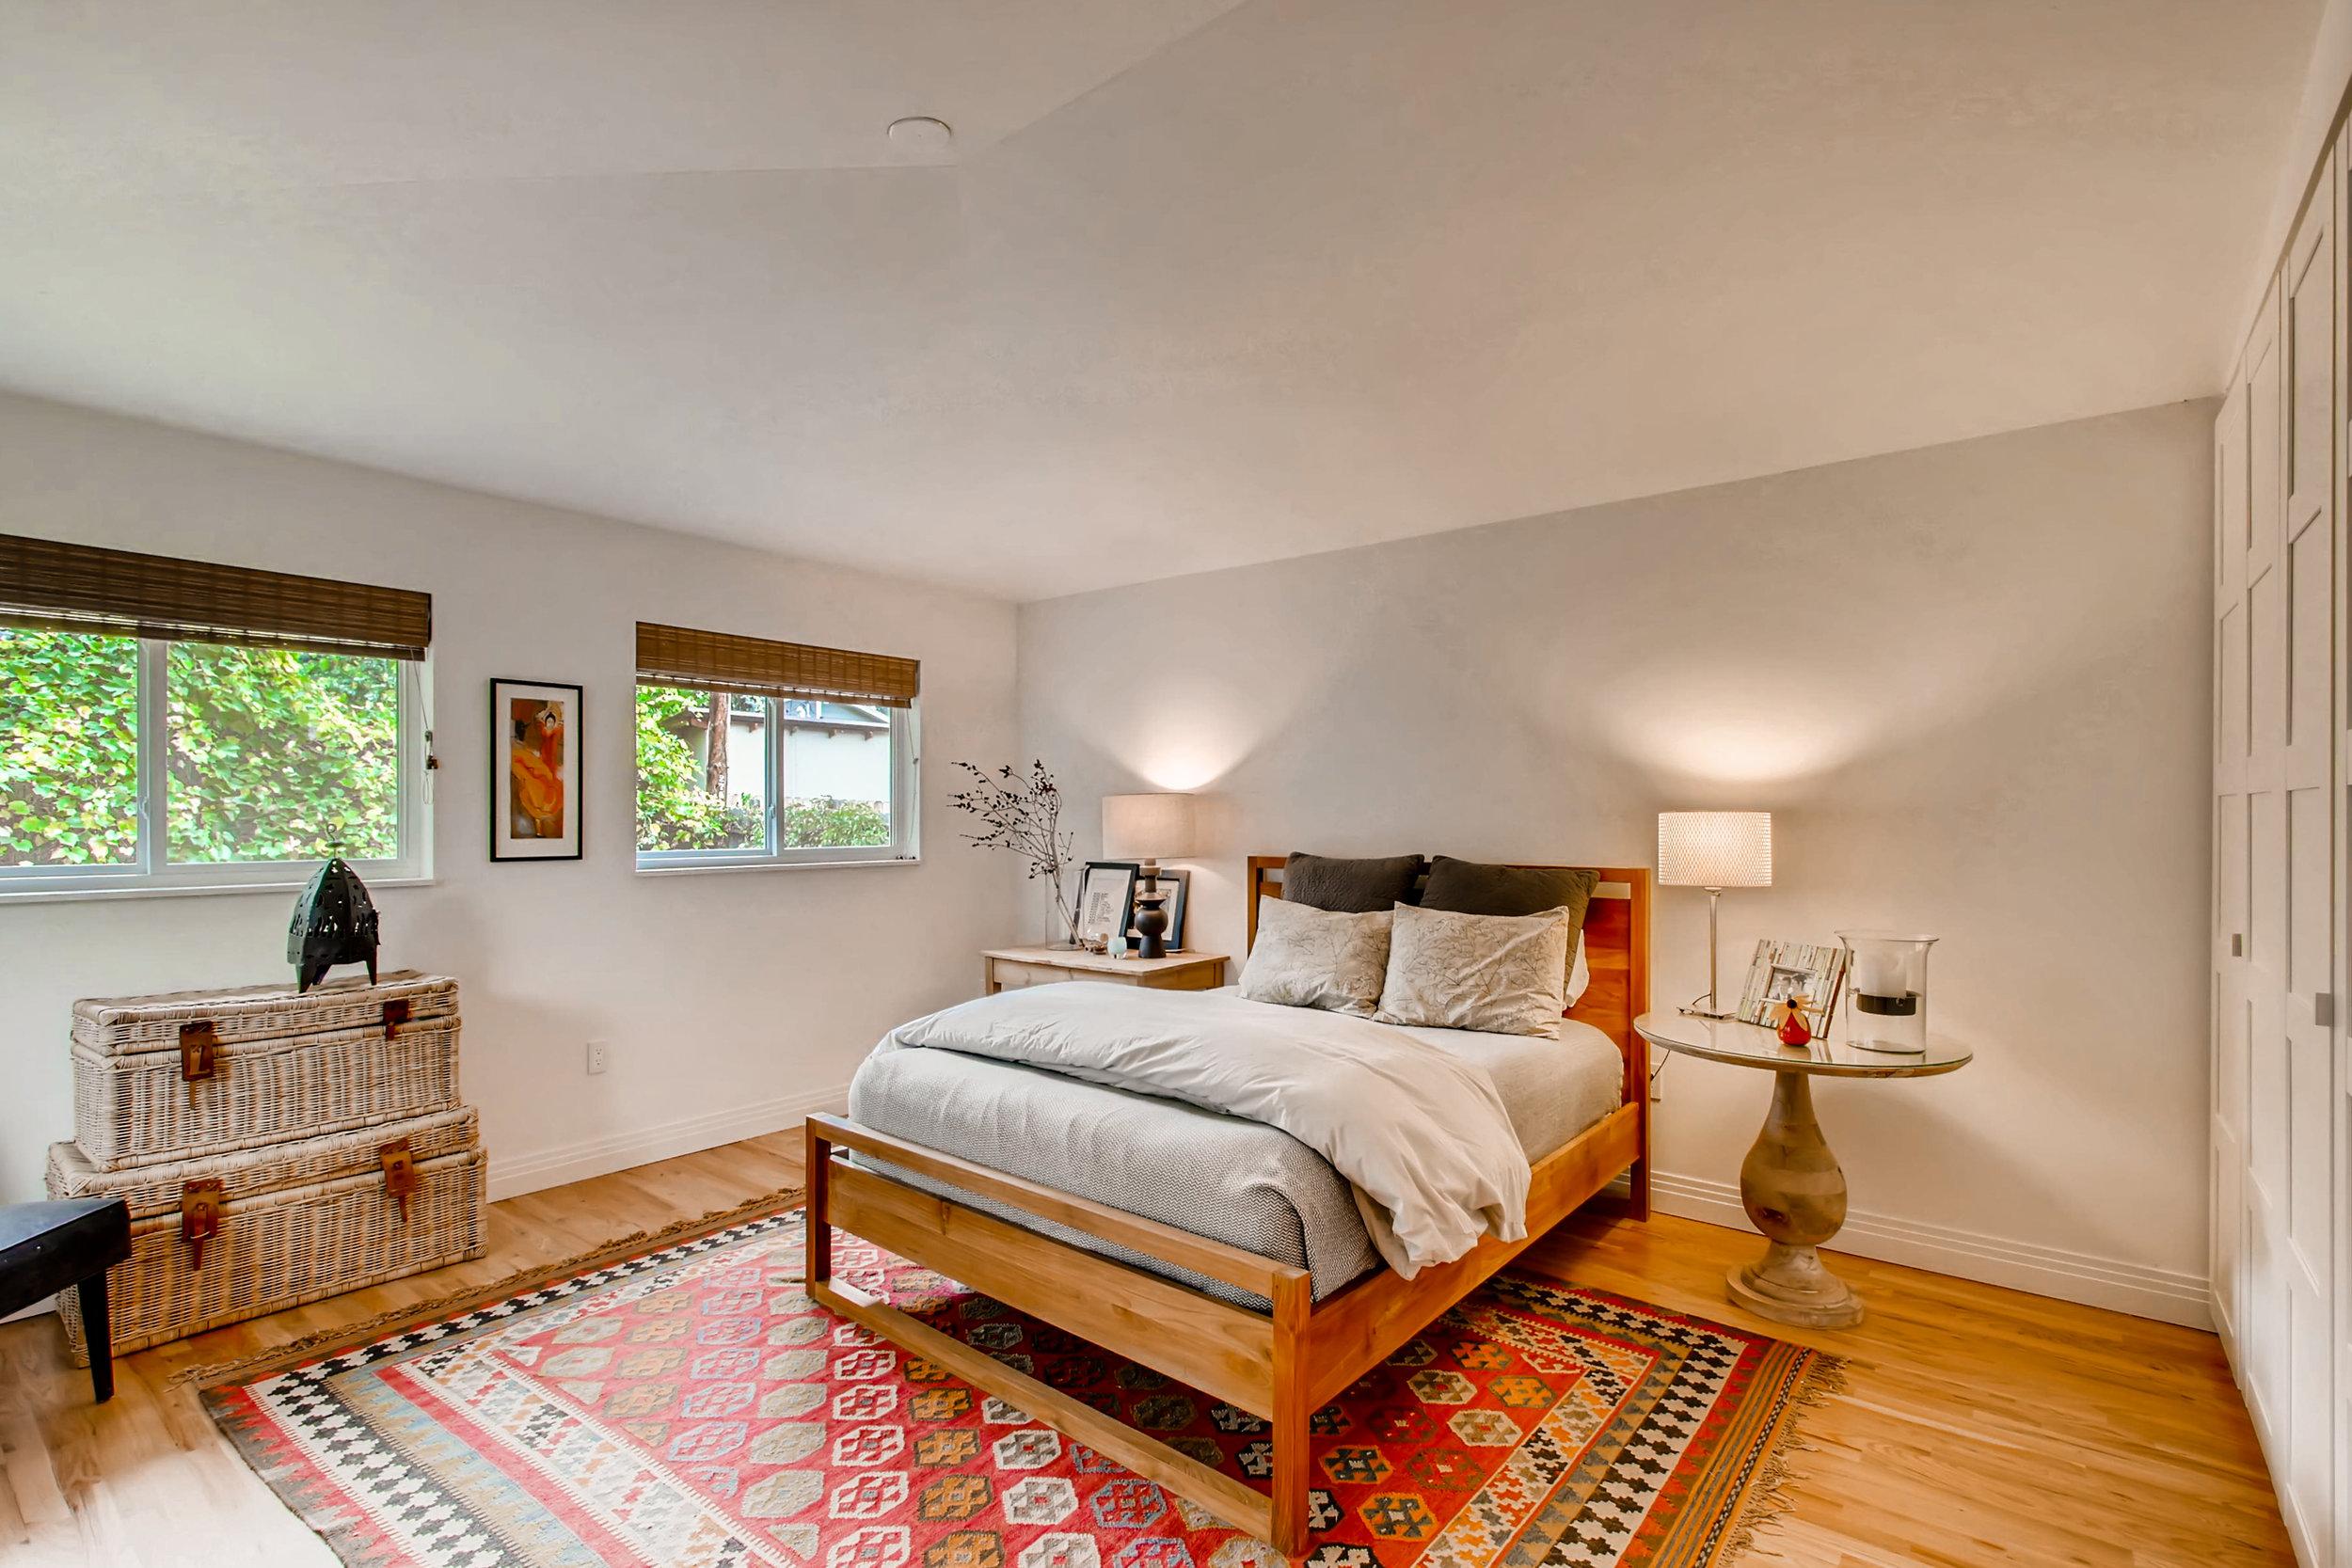 265 30th St Boulder CO 80305-print-013-14-Master Bedroom-3600x2400-300dpi.jpg